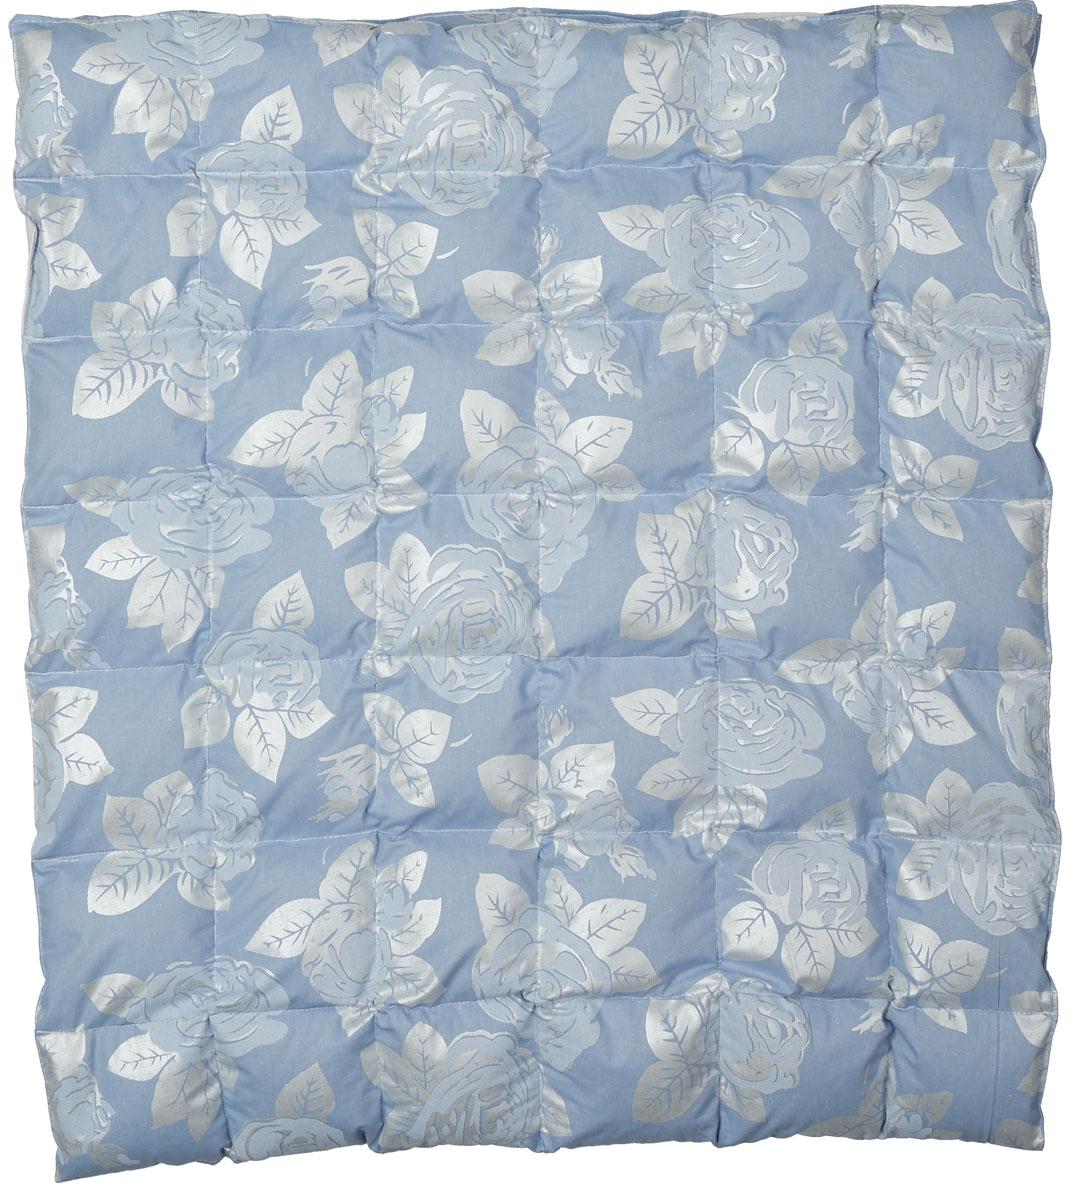 Наматрасник Bio-Textiles, наполнитель: лузга гречихи, 140 х 195 см world textiles a sourcebook